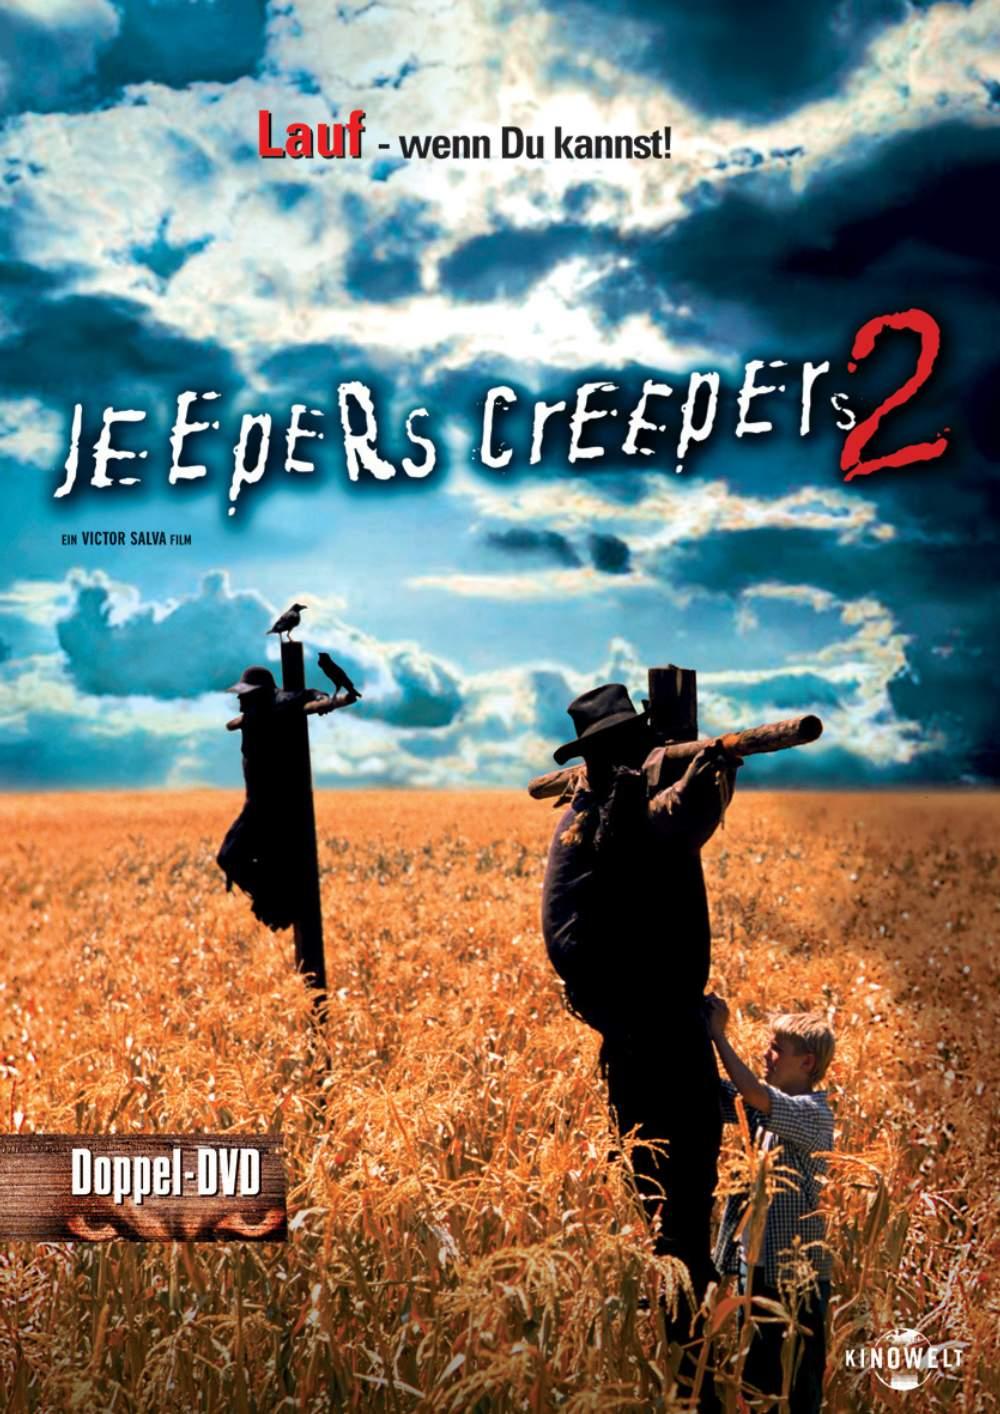 فيلم jeepers creepers مترجم